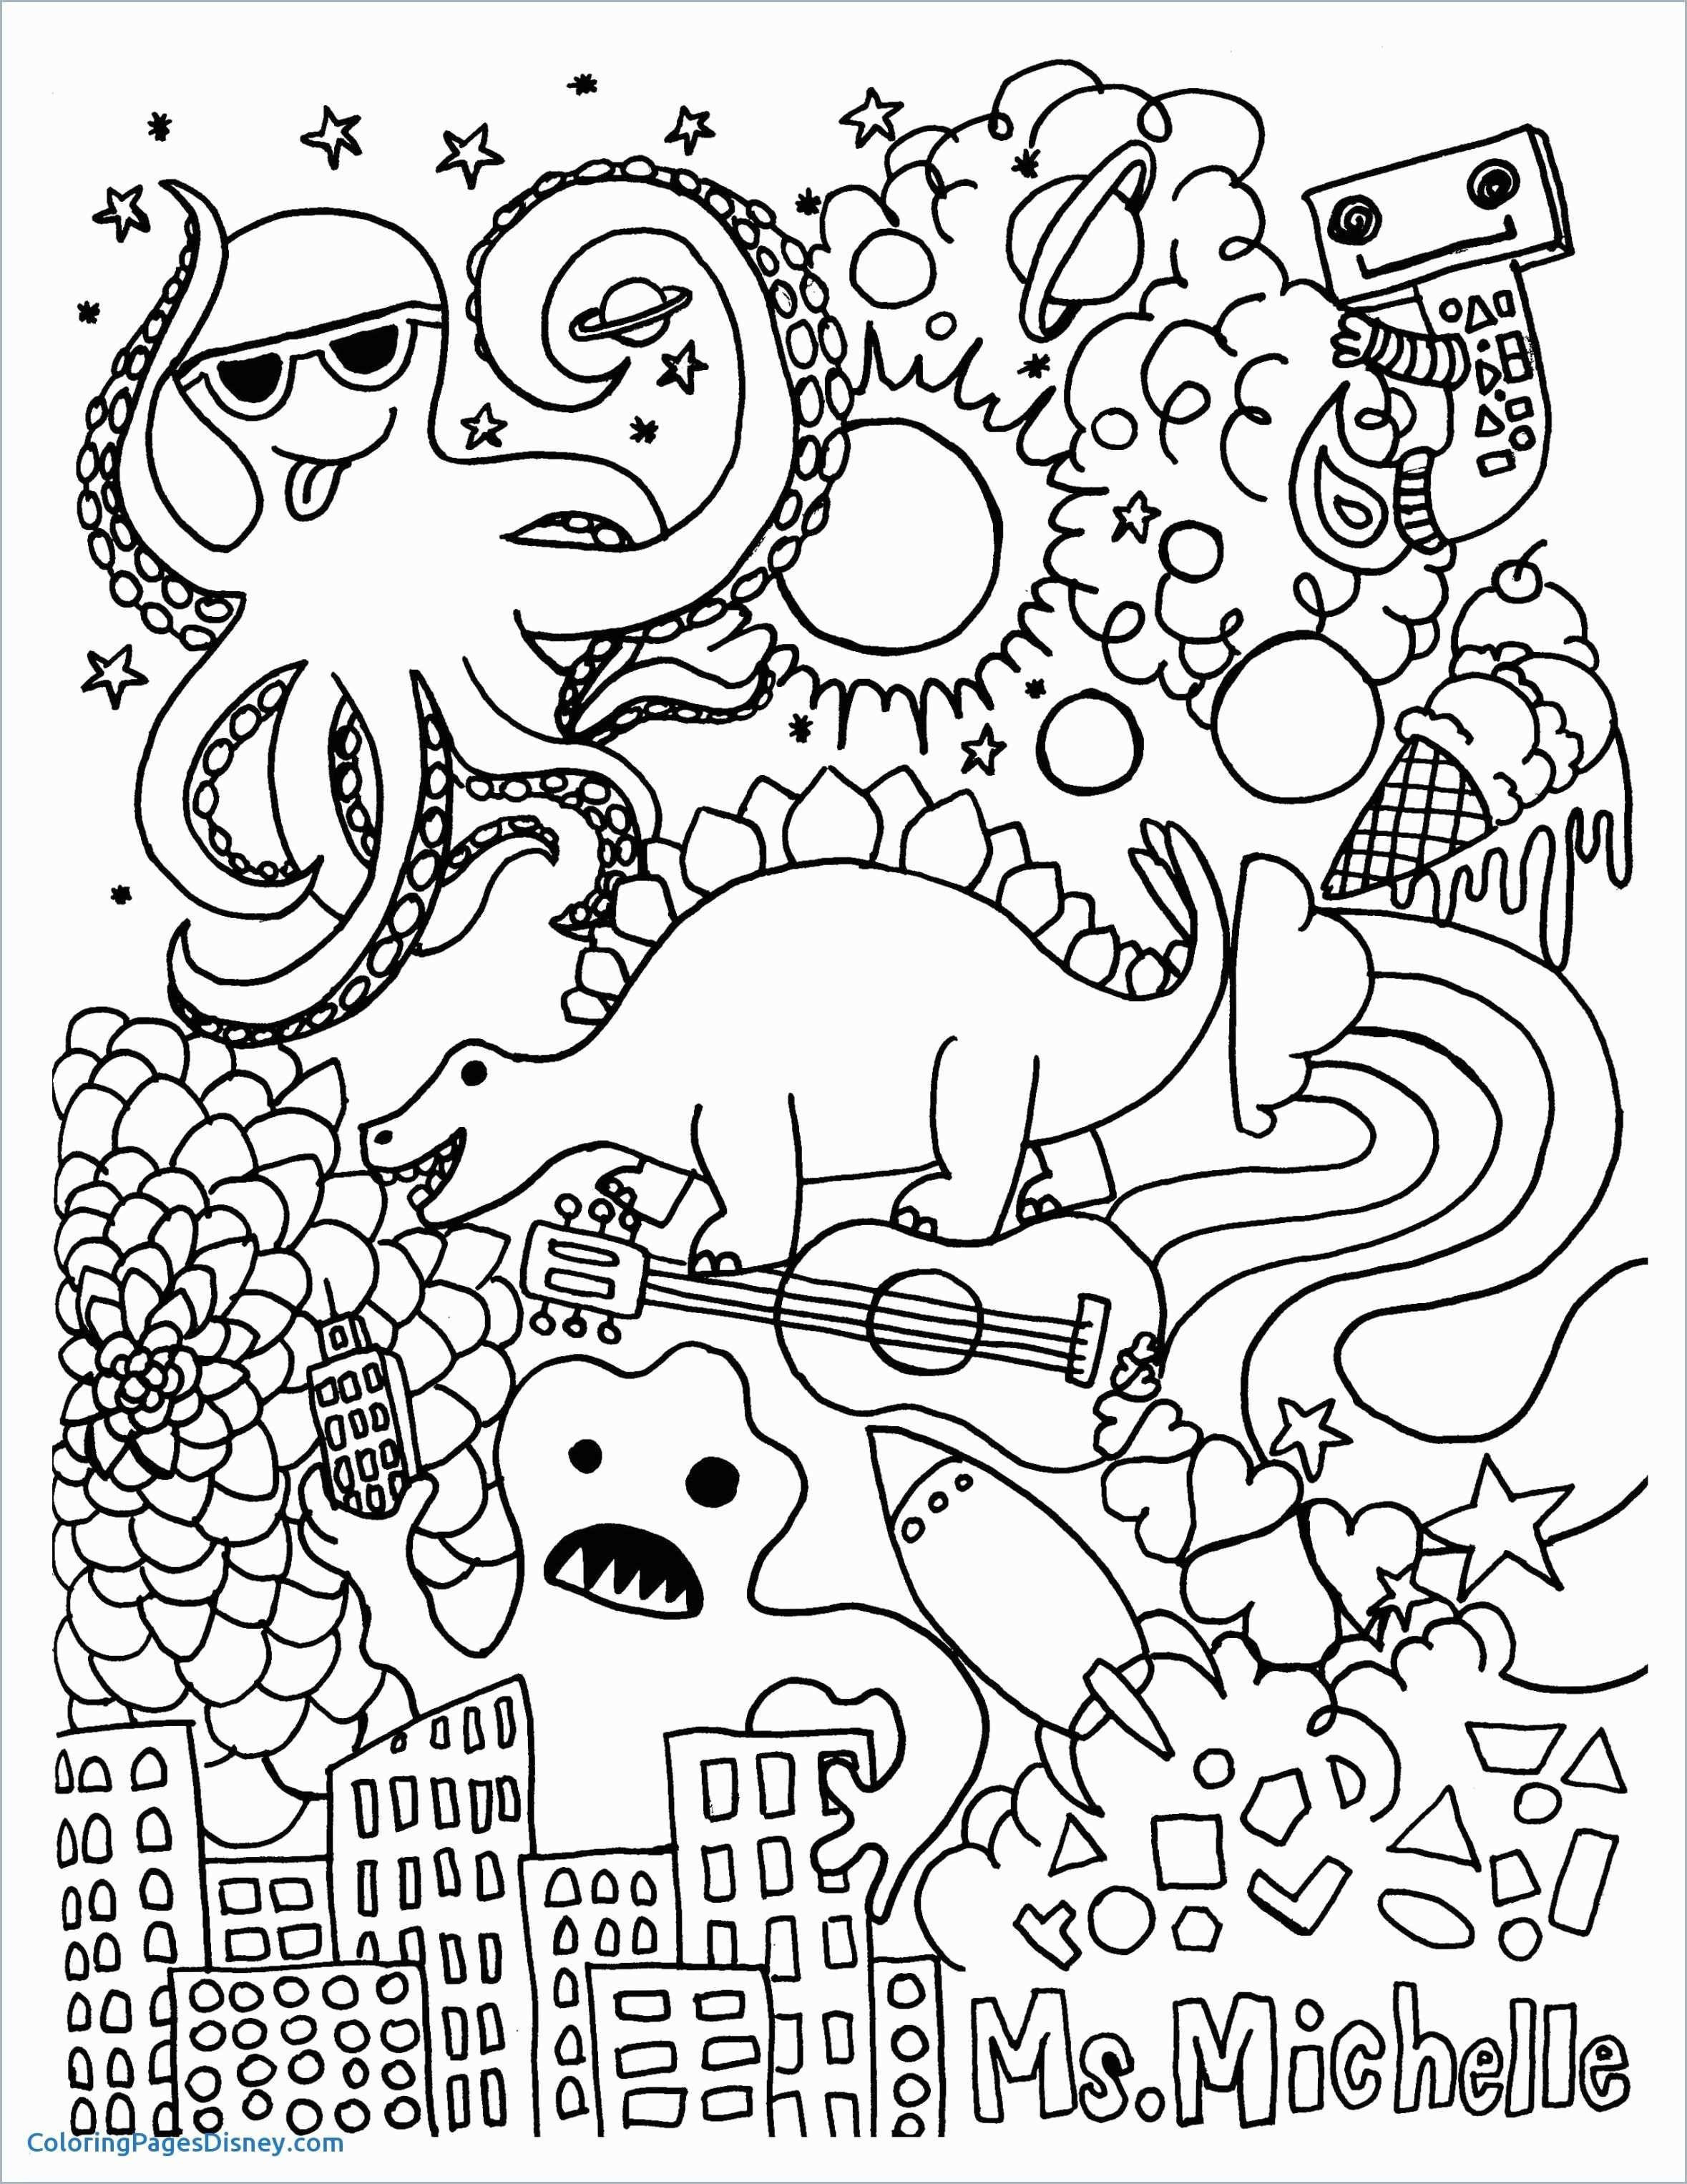 Ausmalbilder Mia and Me Kostenlos Neu Mia and Me Coloring Pages Pretty Walt Disney Ausmalbilder Bilder